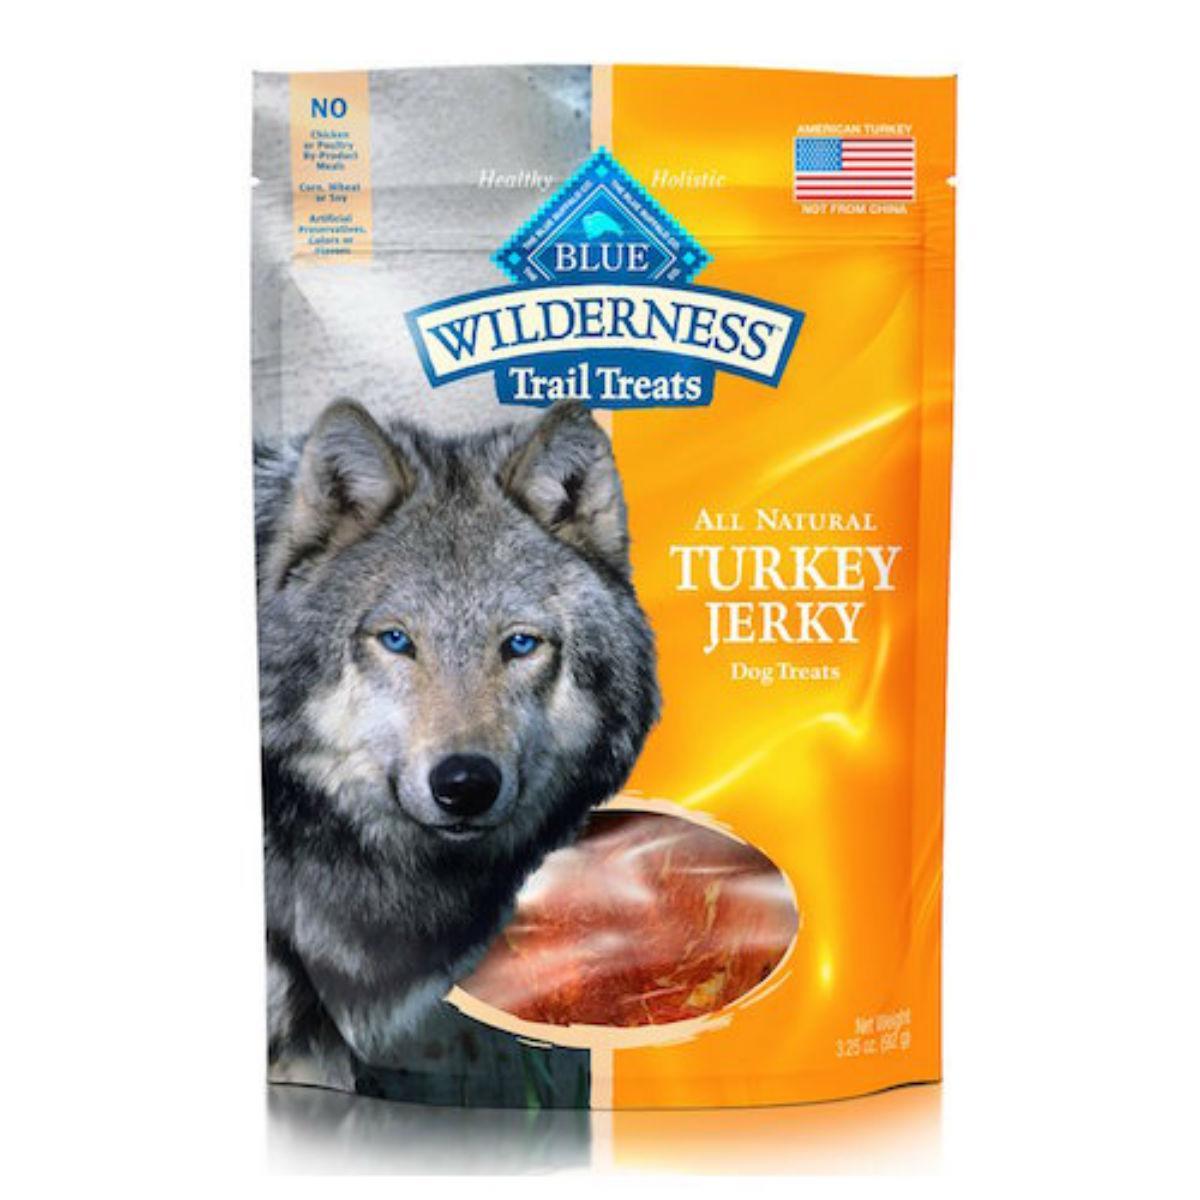 Blue Buffalo Wilderness Turkey Jerky Dog Treats